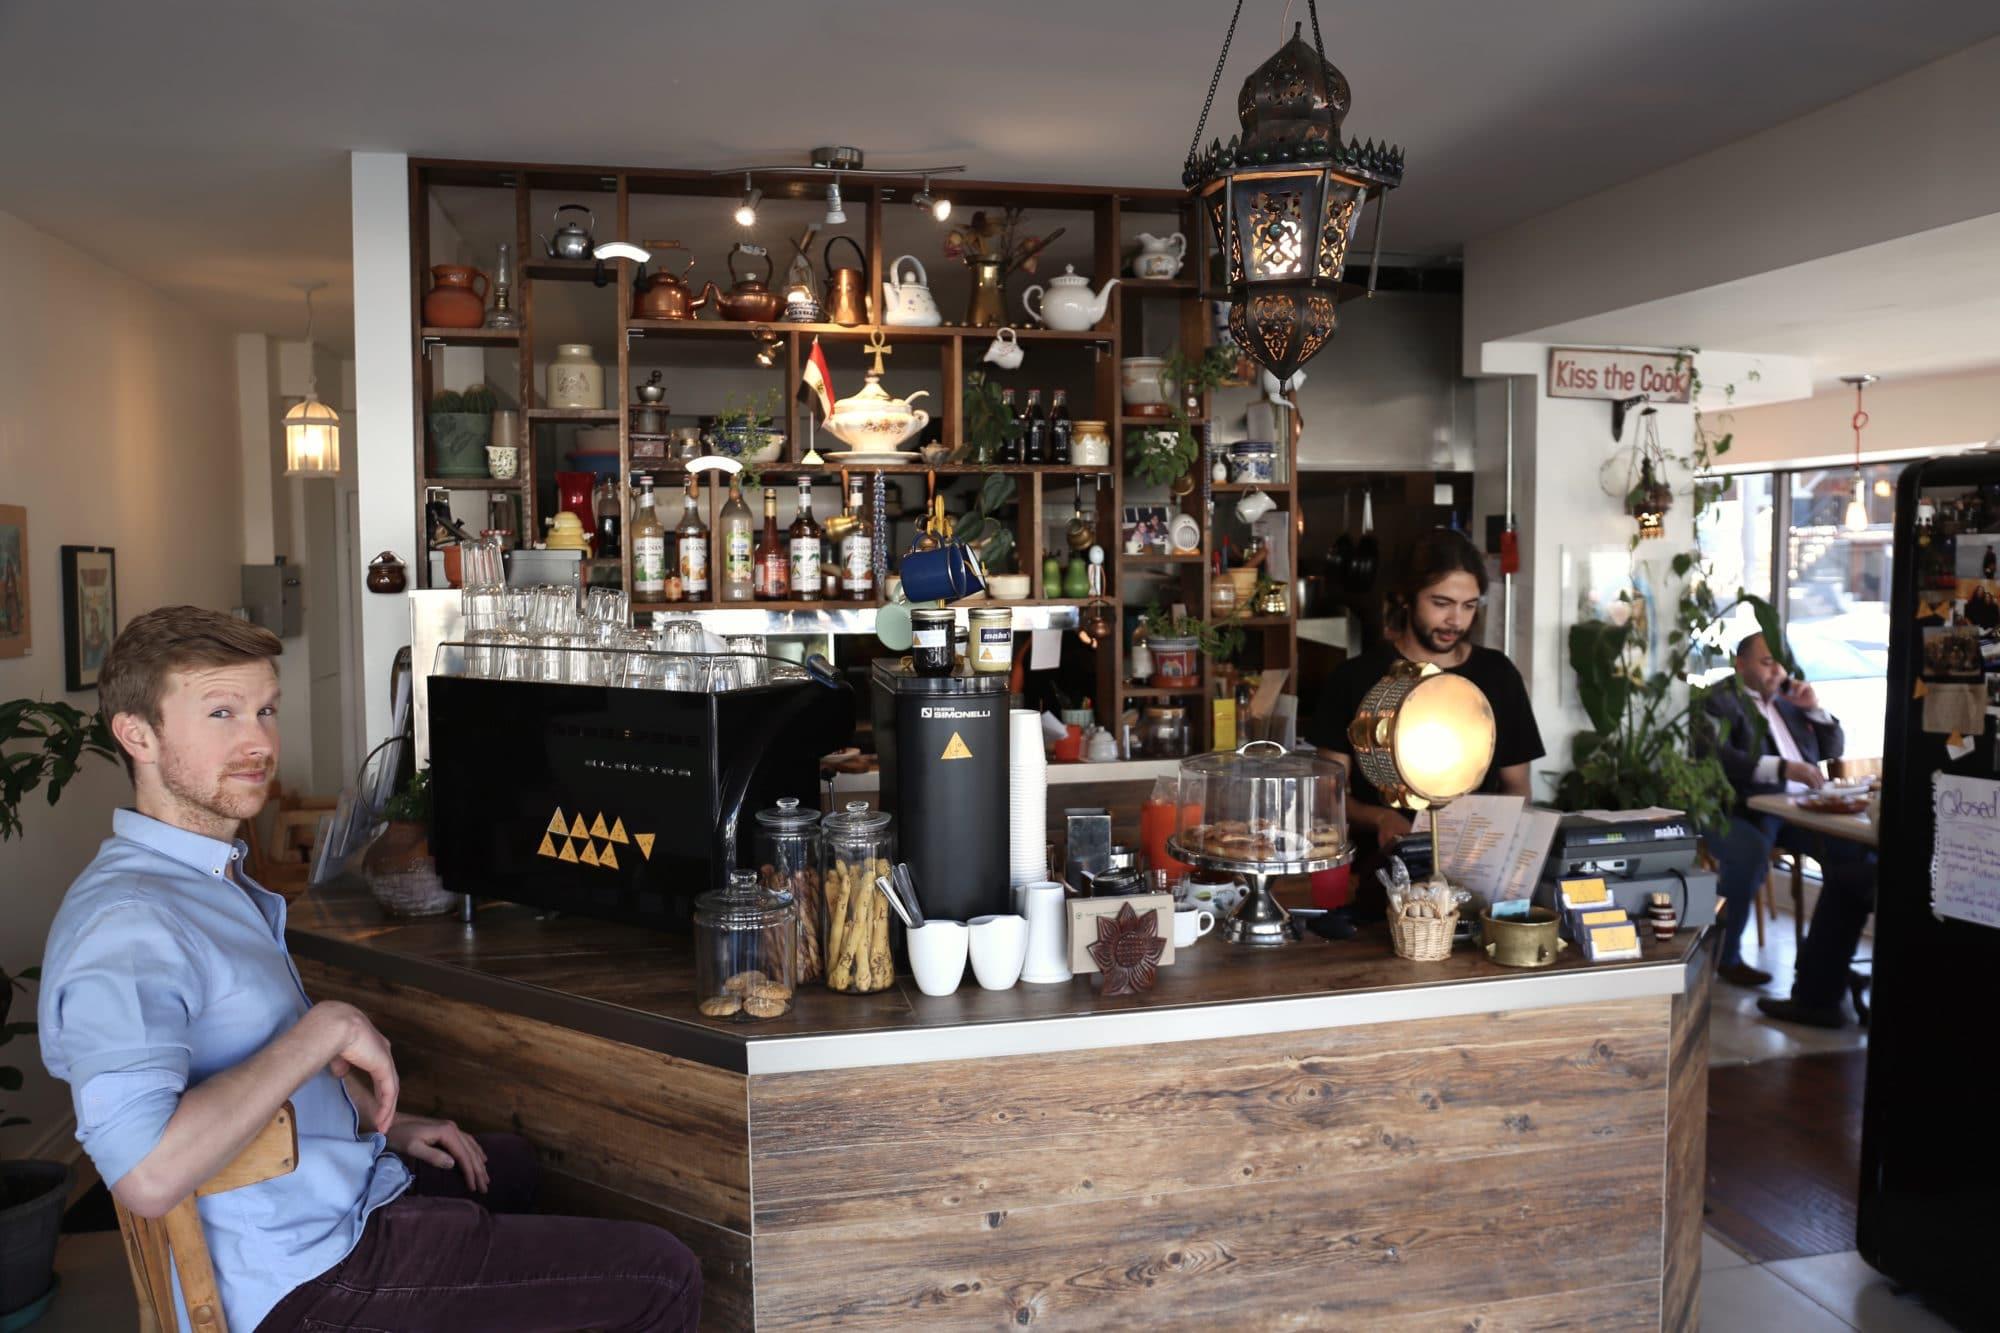 Step inside Maha's Toronto, a popular brunch restaurant in Little India.